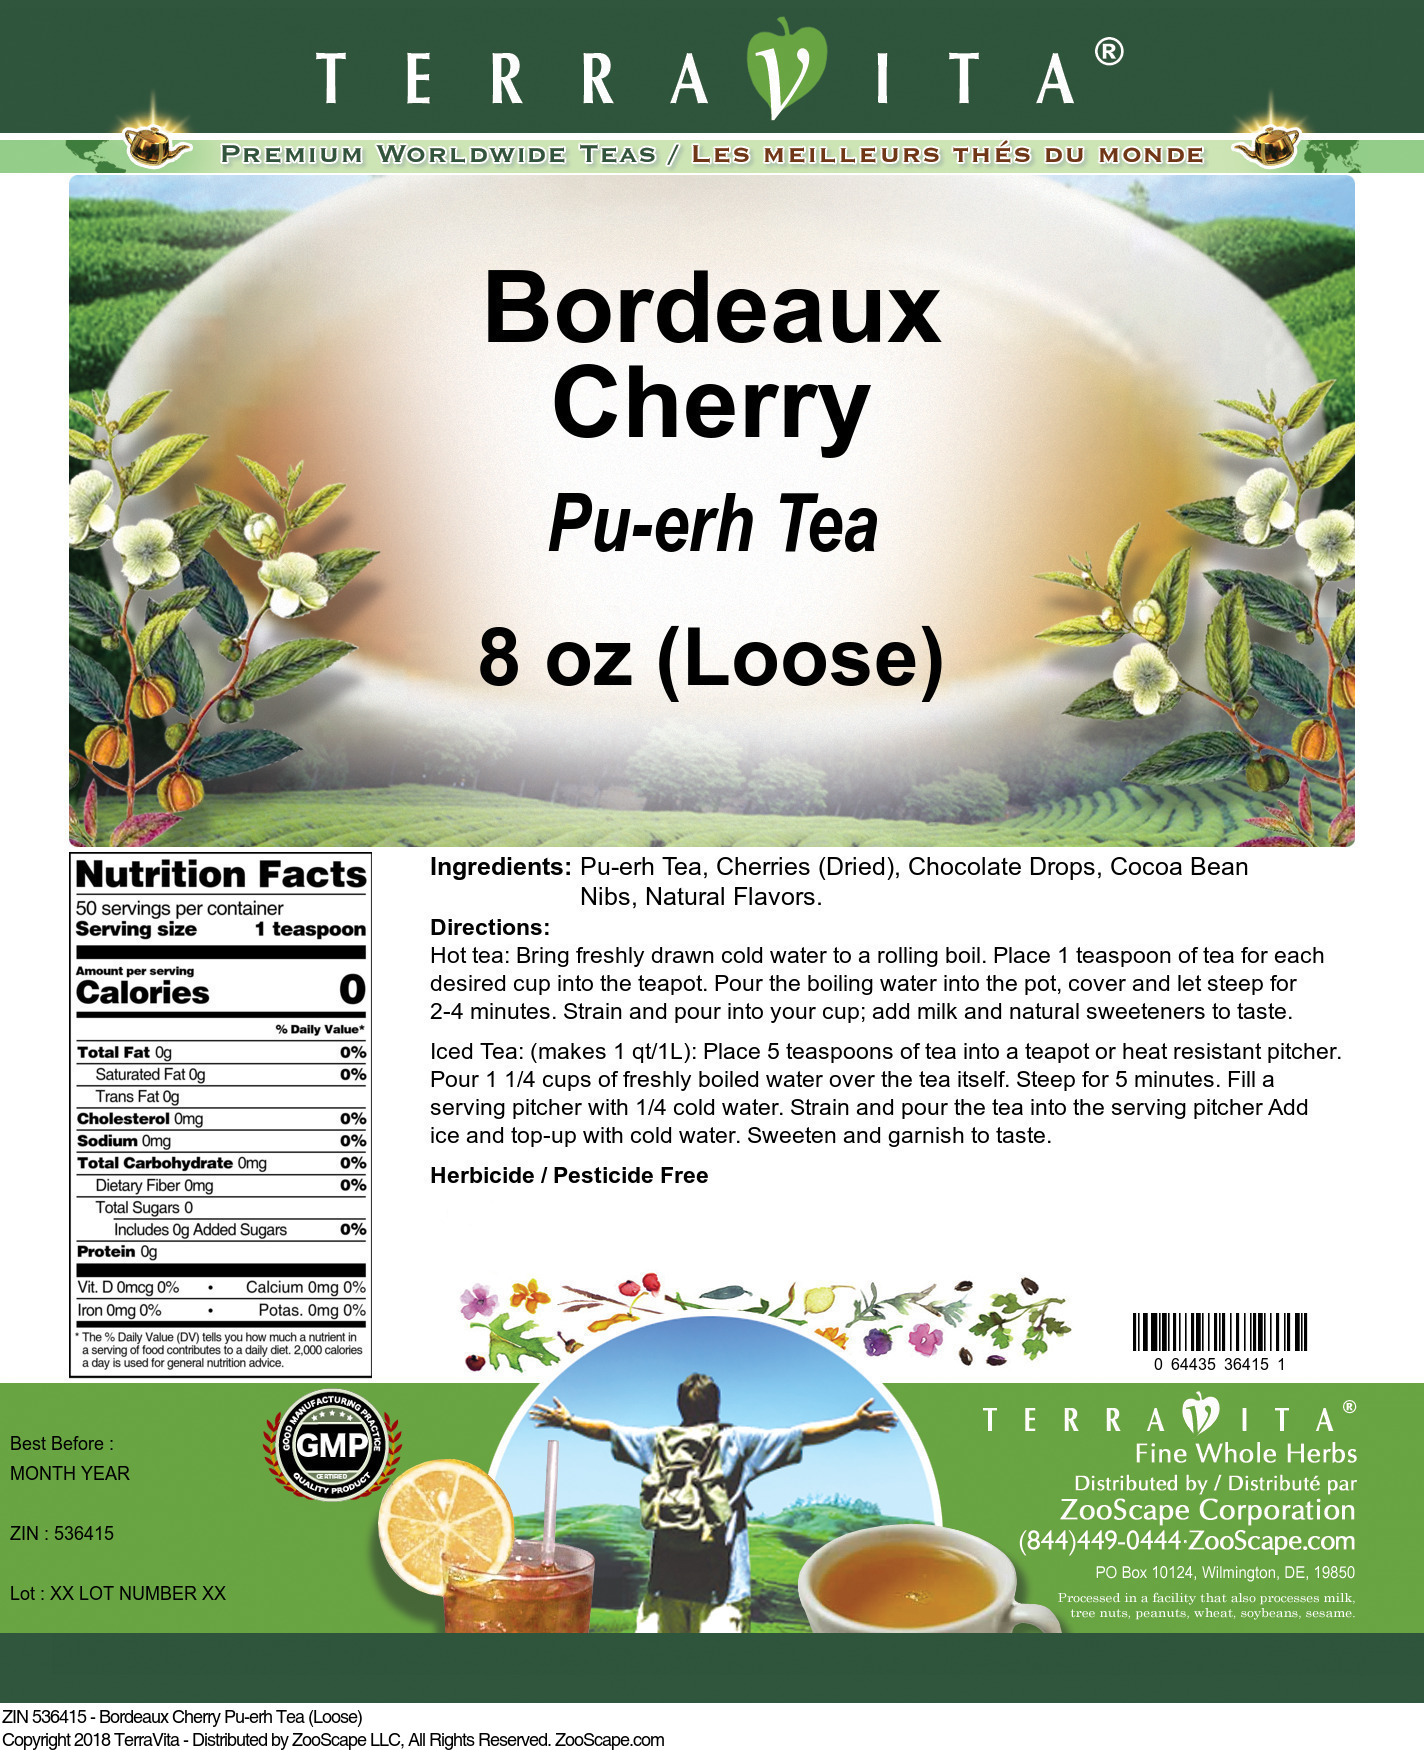 Bordeaux Cherry Pu-erh Tea